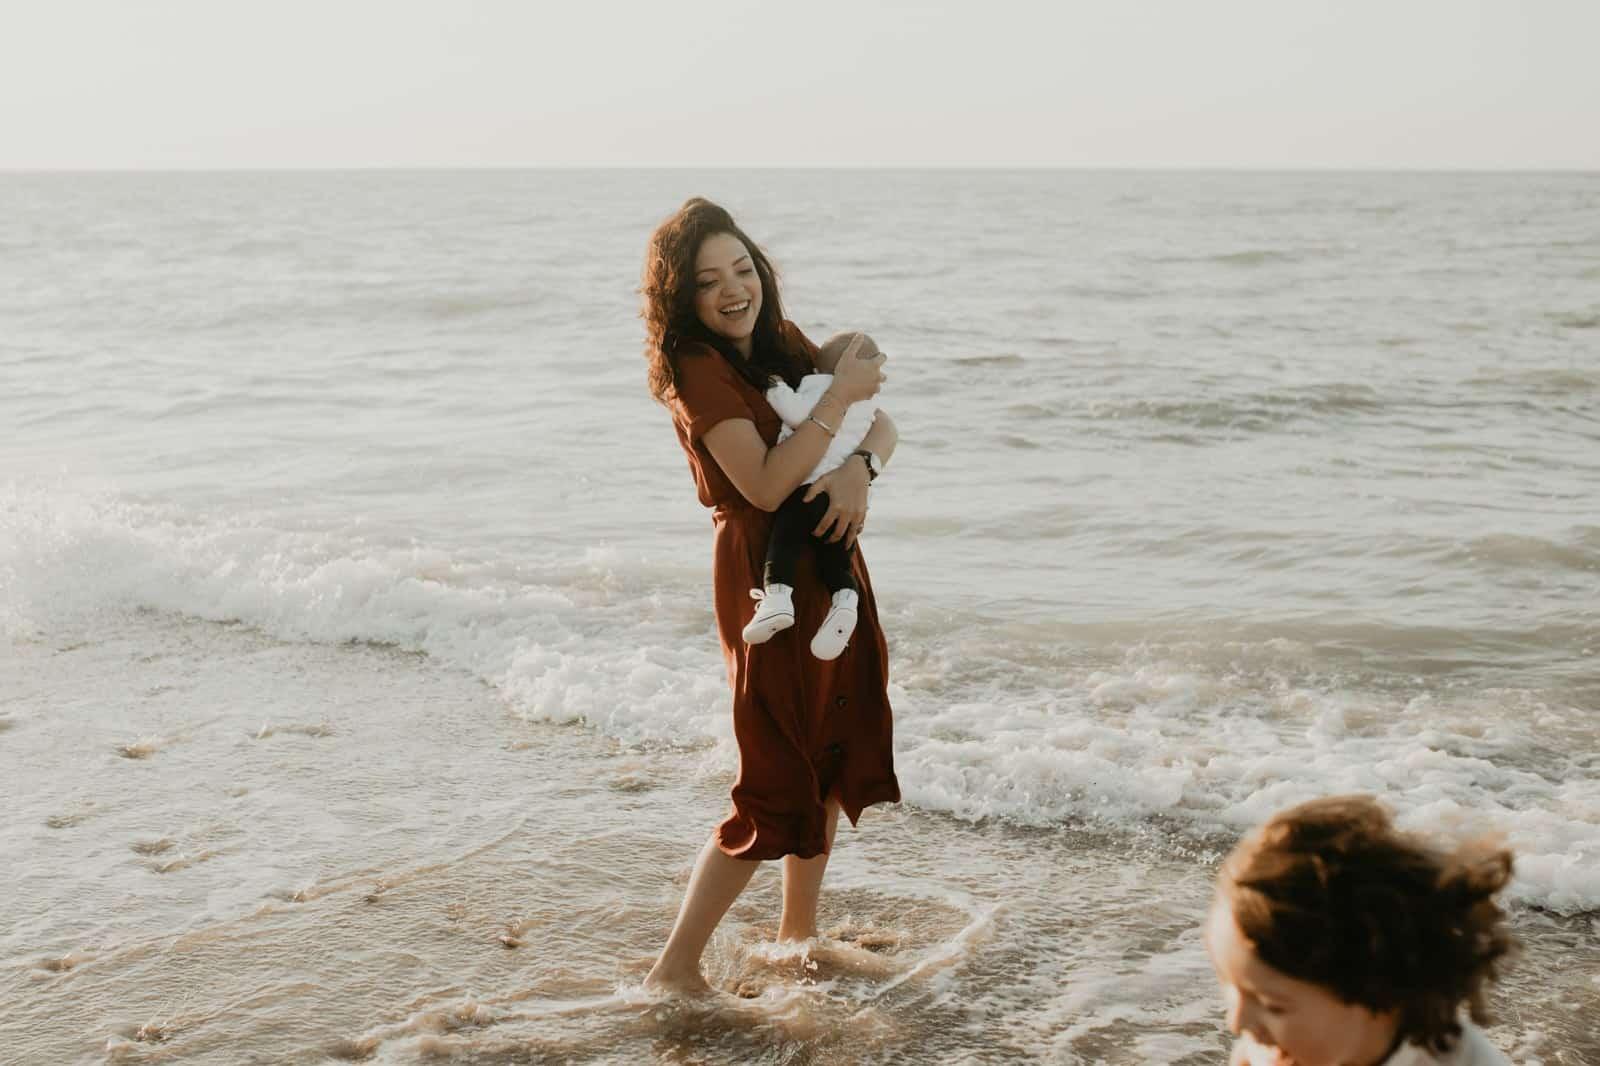 film enfant famille plage photo